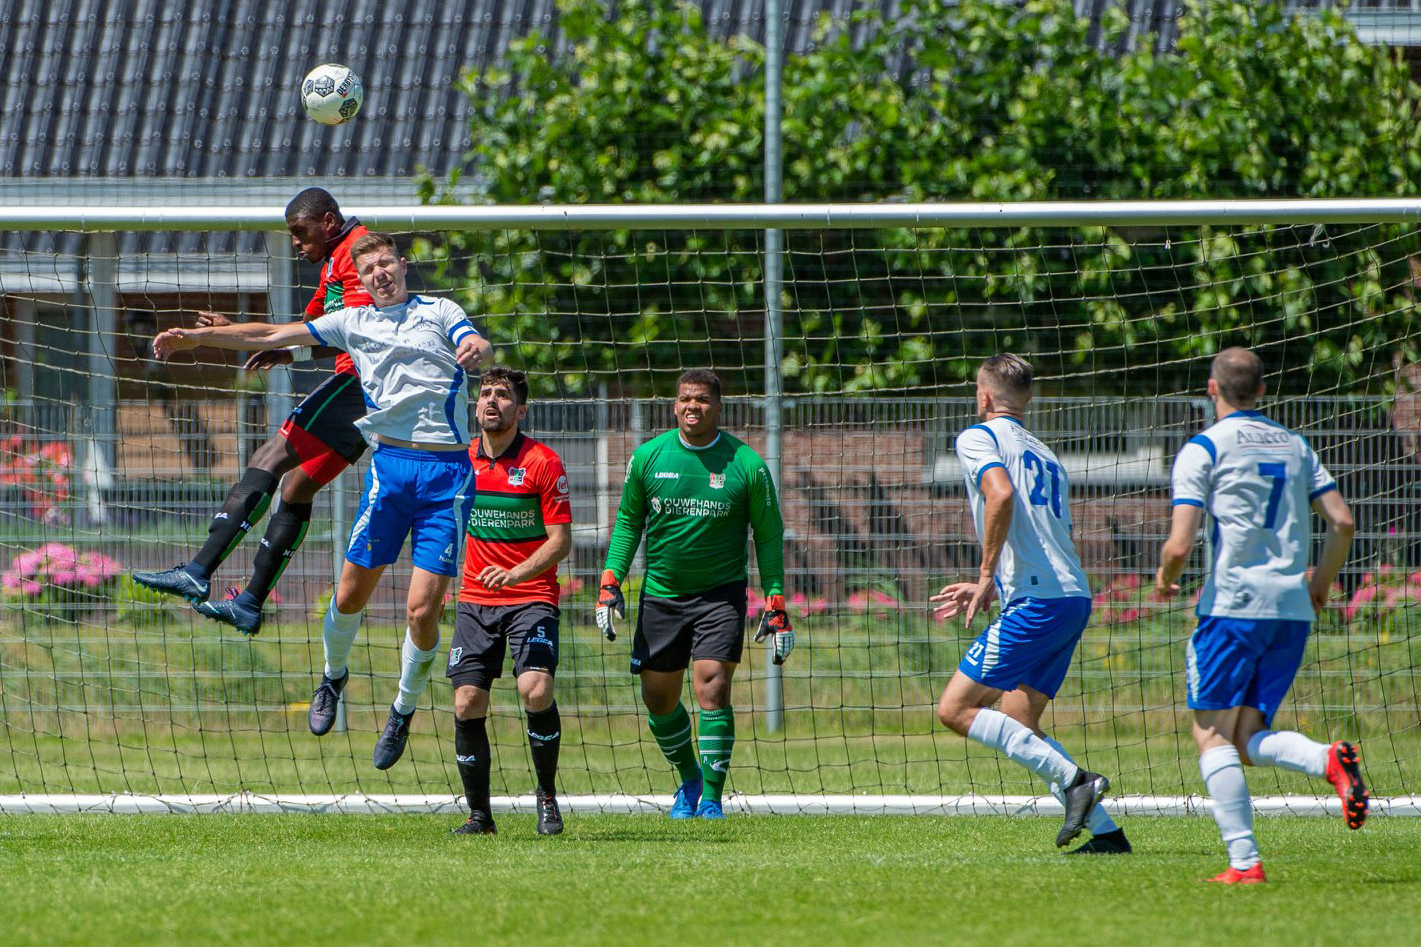 Julian Kootstra SC NEC Nijmegen KlasseKeepers